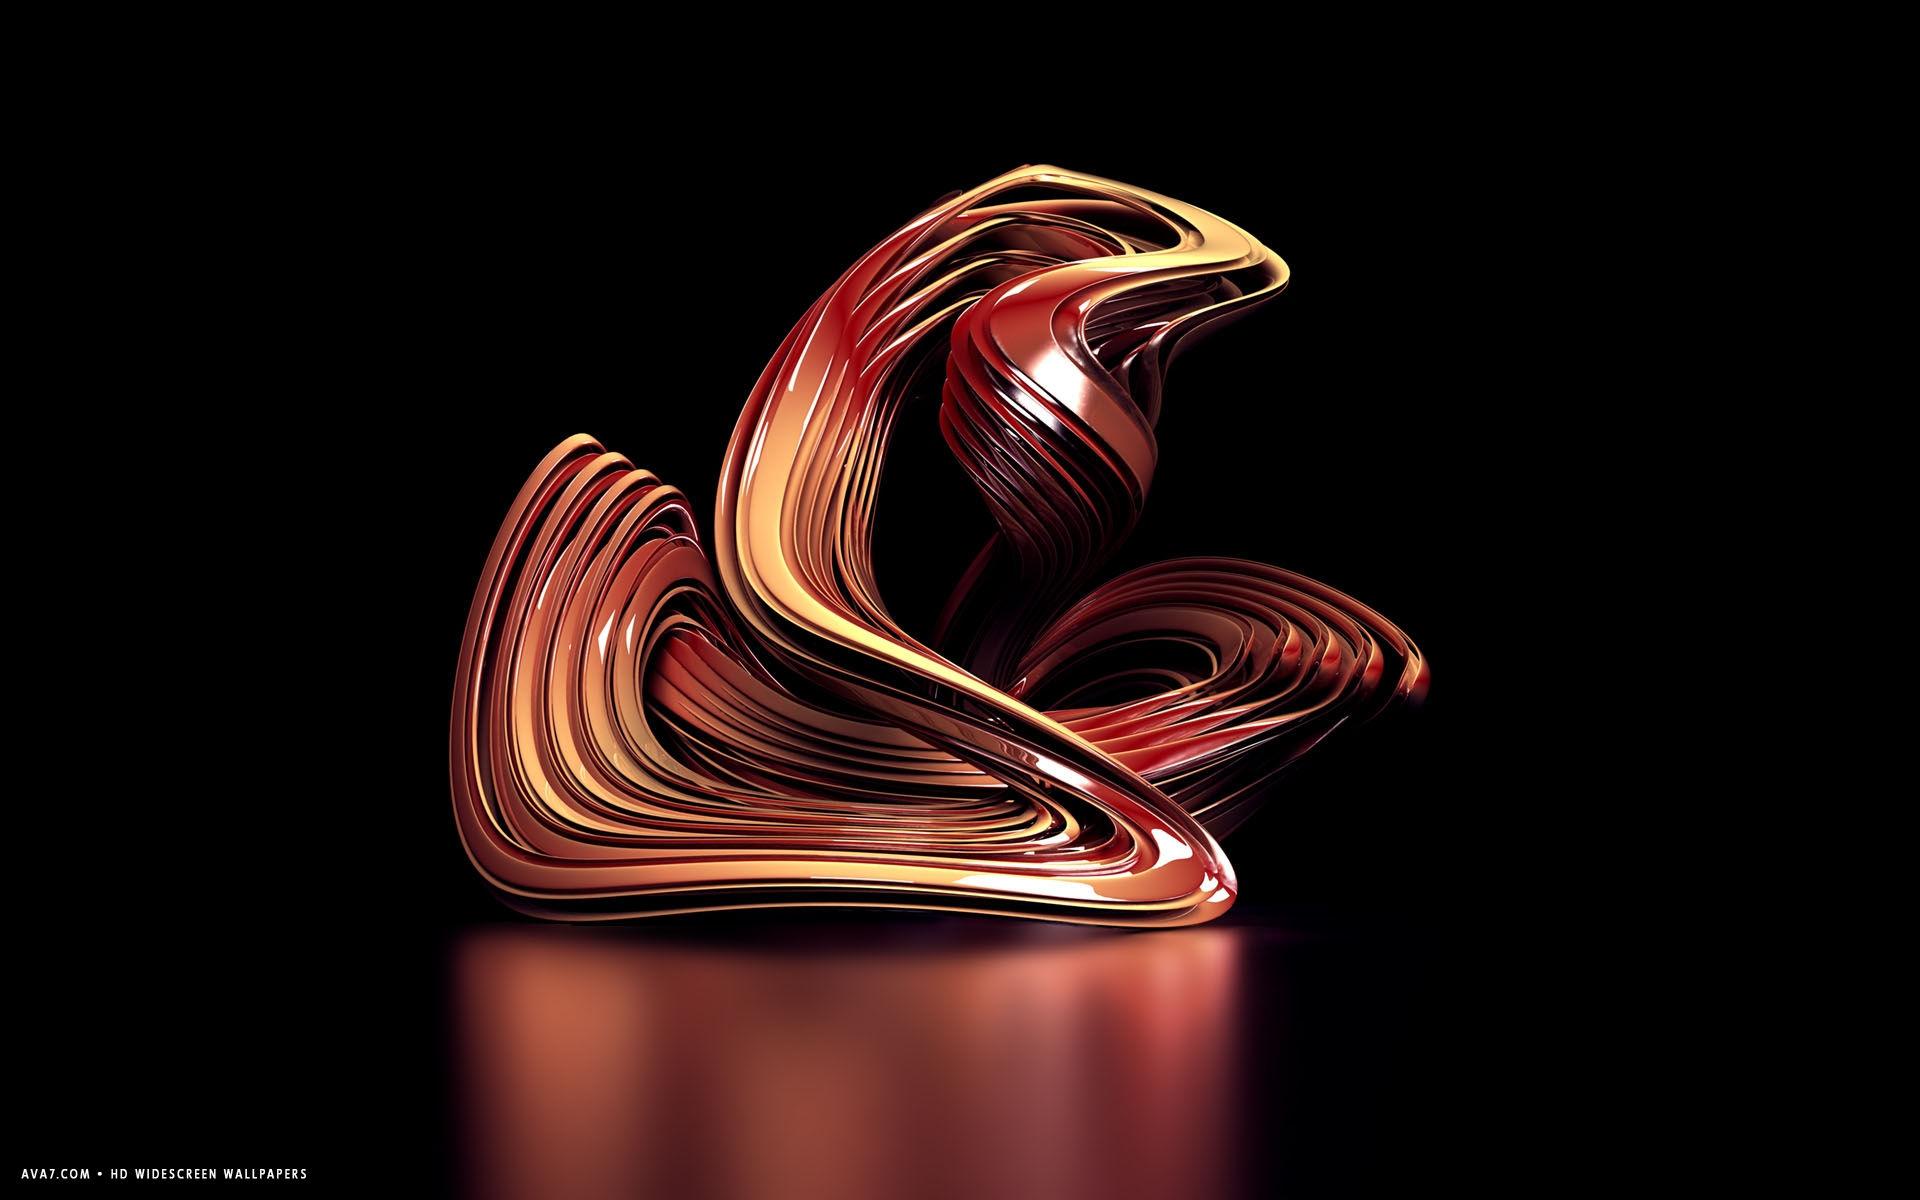 3d Animated Snake Live Wallpaper 3d Sculpture Red Abstract Shape Hd Widescreen Wallpaper